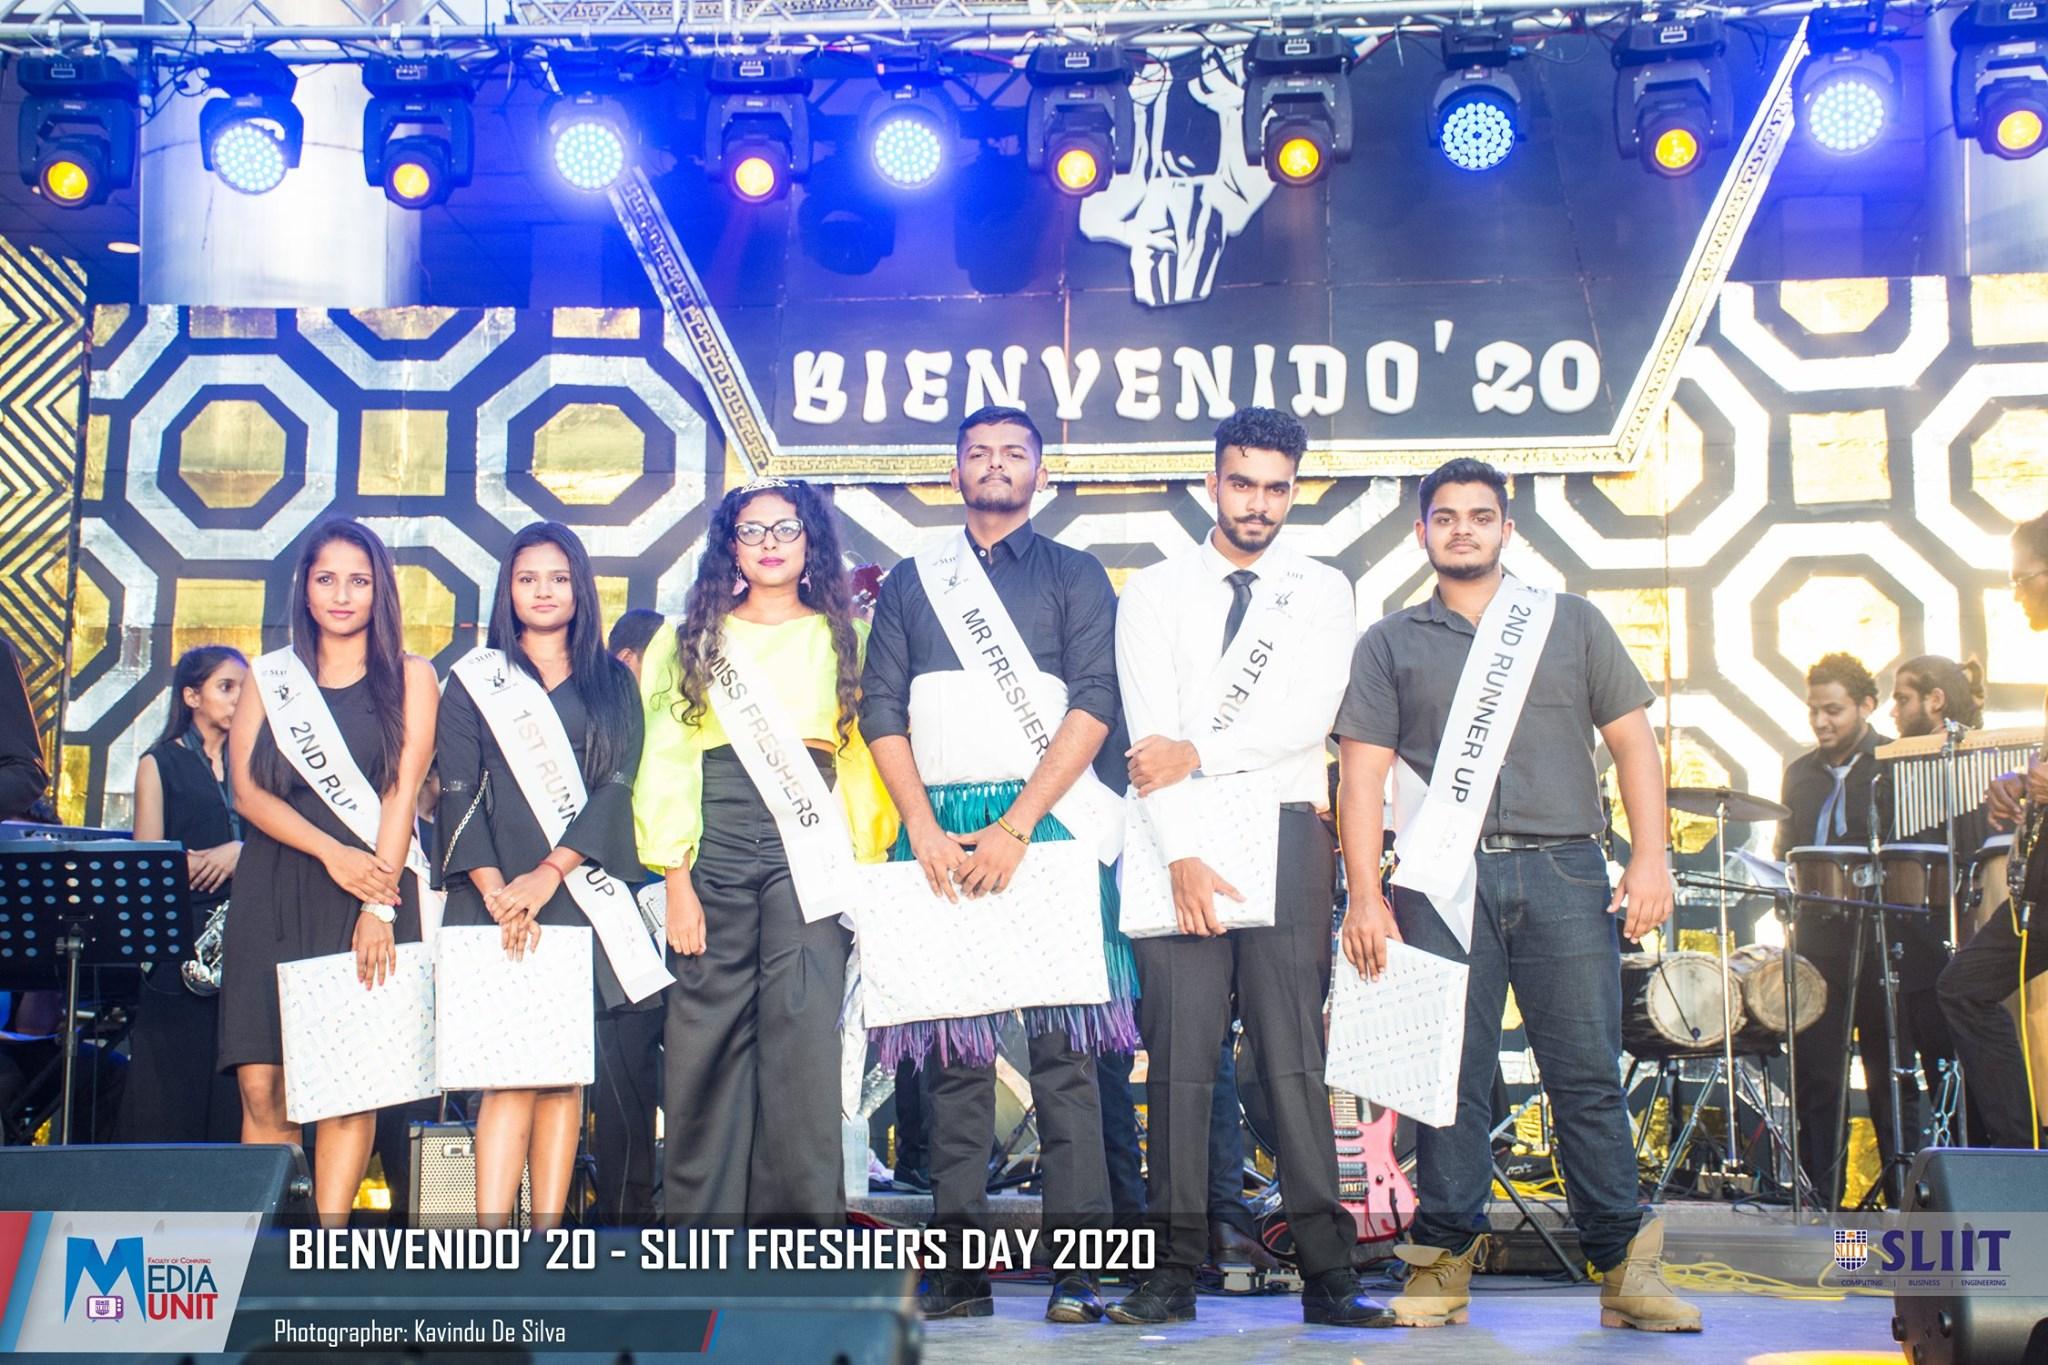 Bienvenido-20-SLIIT-Freshers-Day-2020-